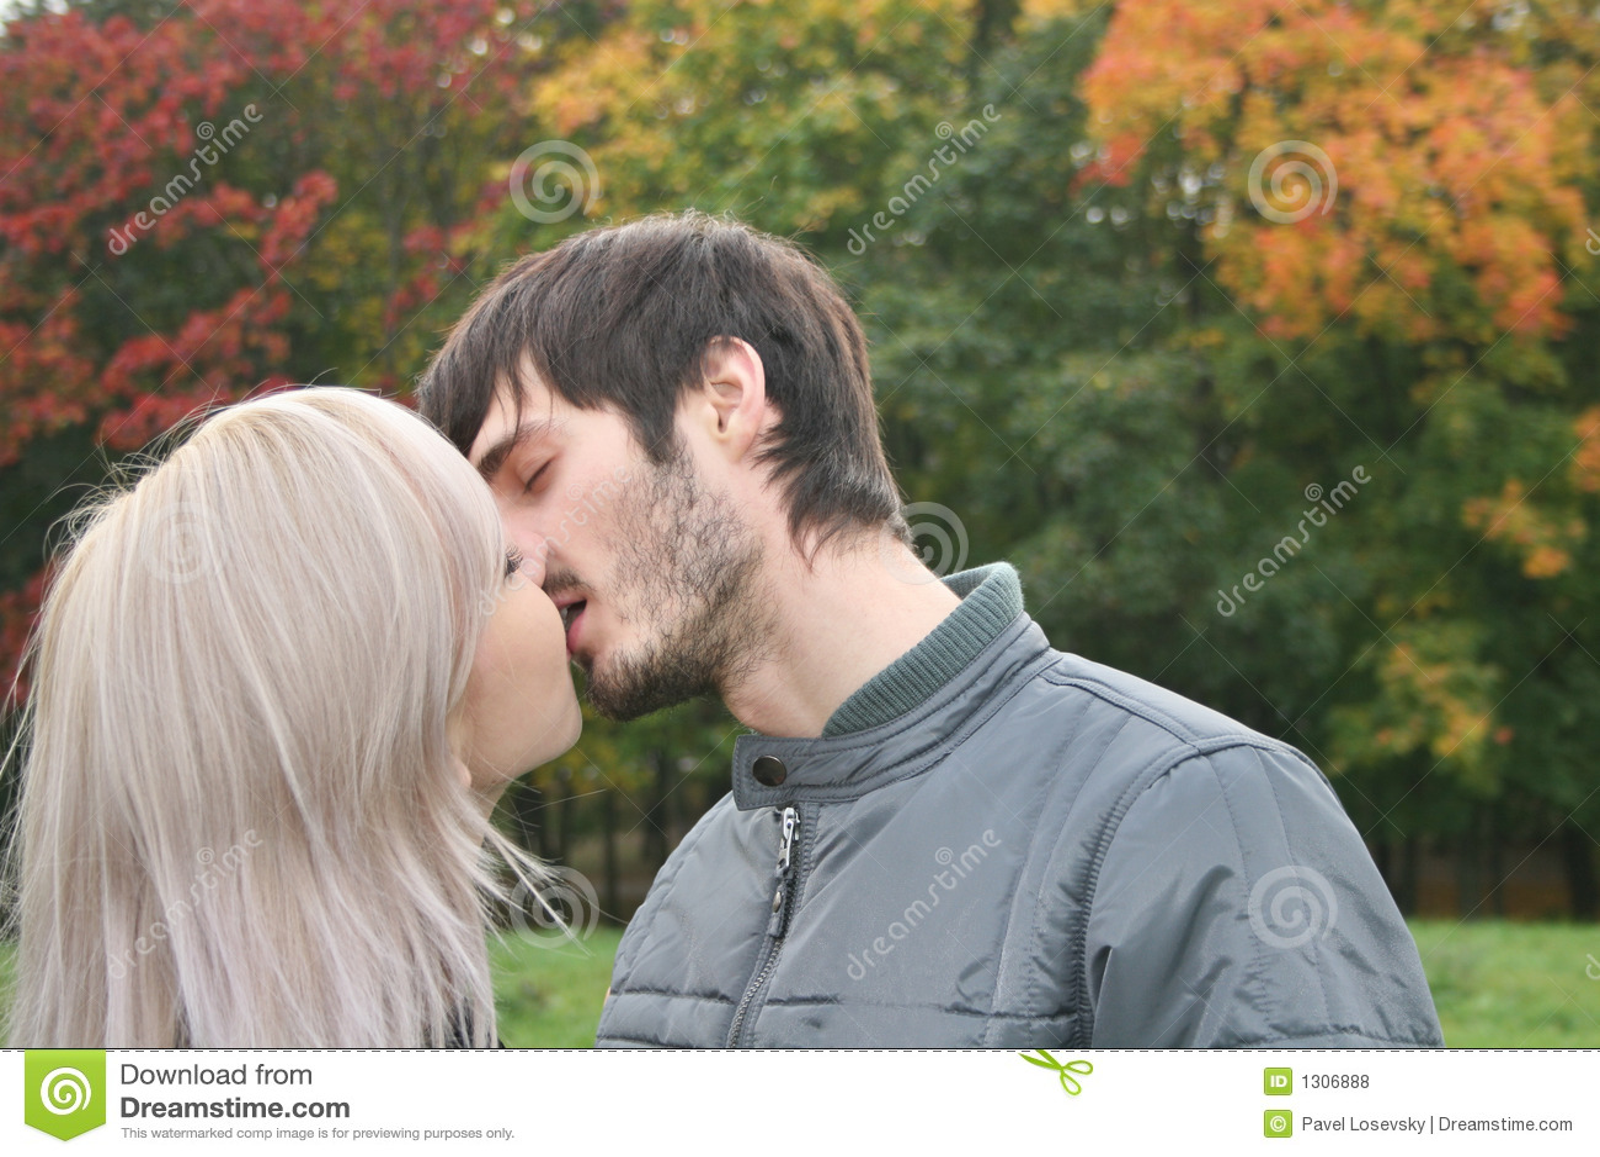 She is dating a gangster full movie kathniel kilig